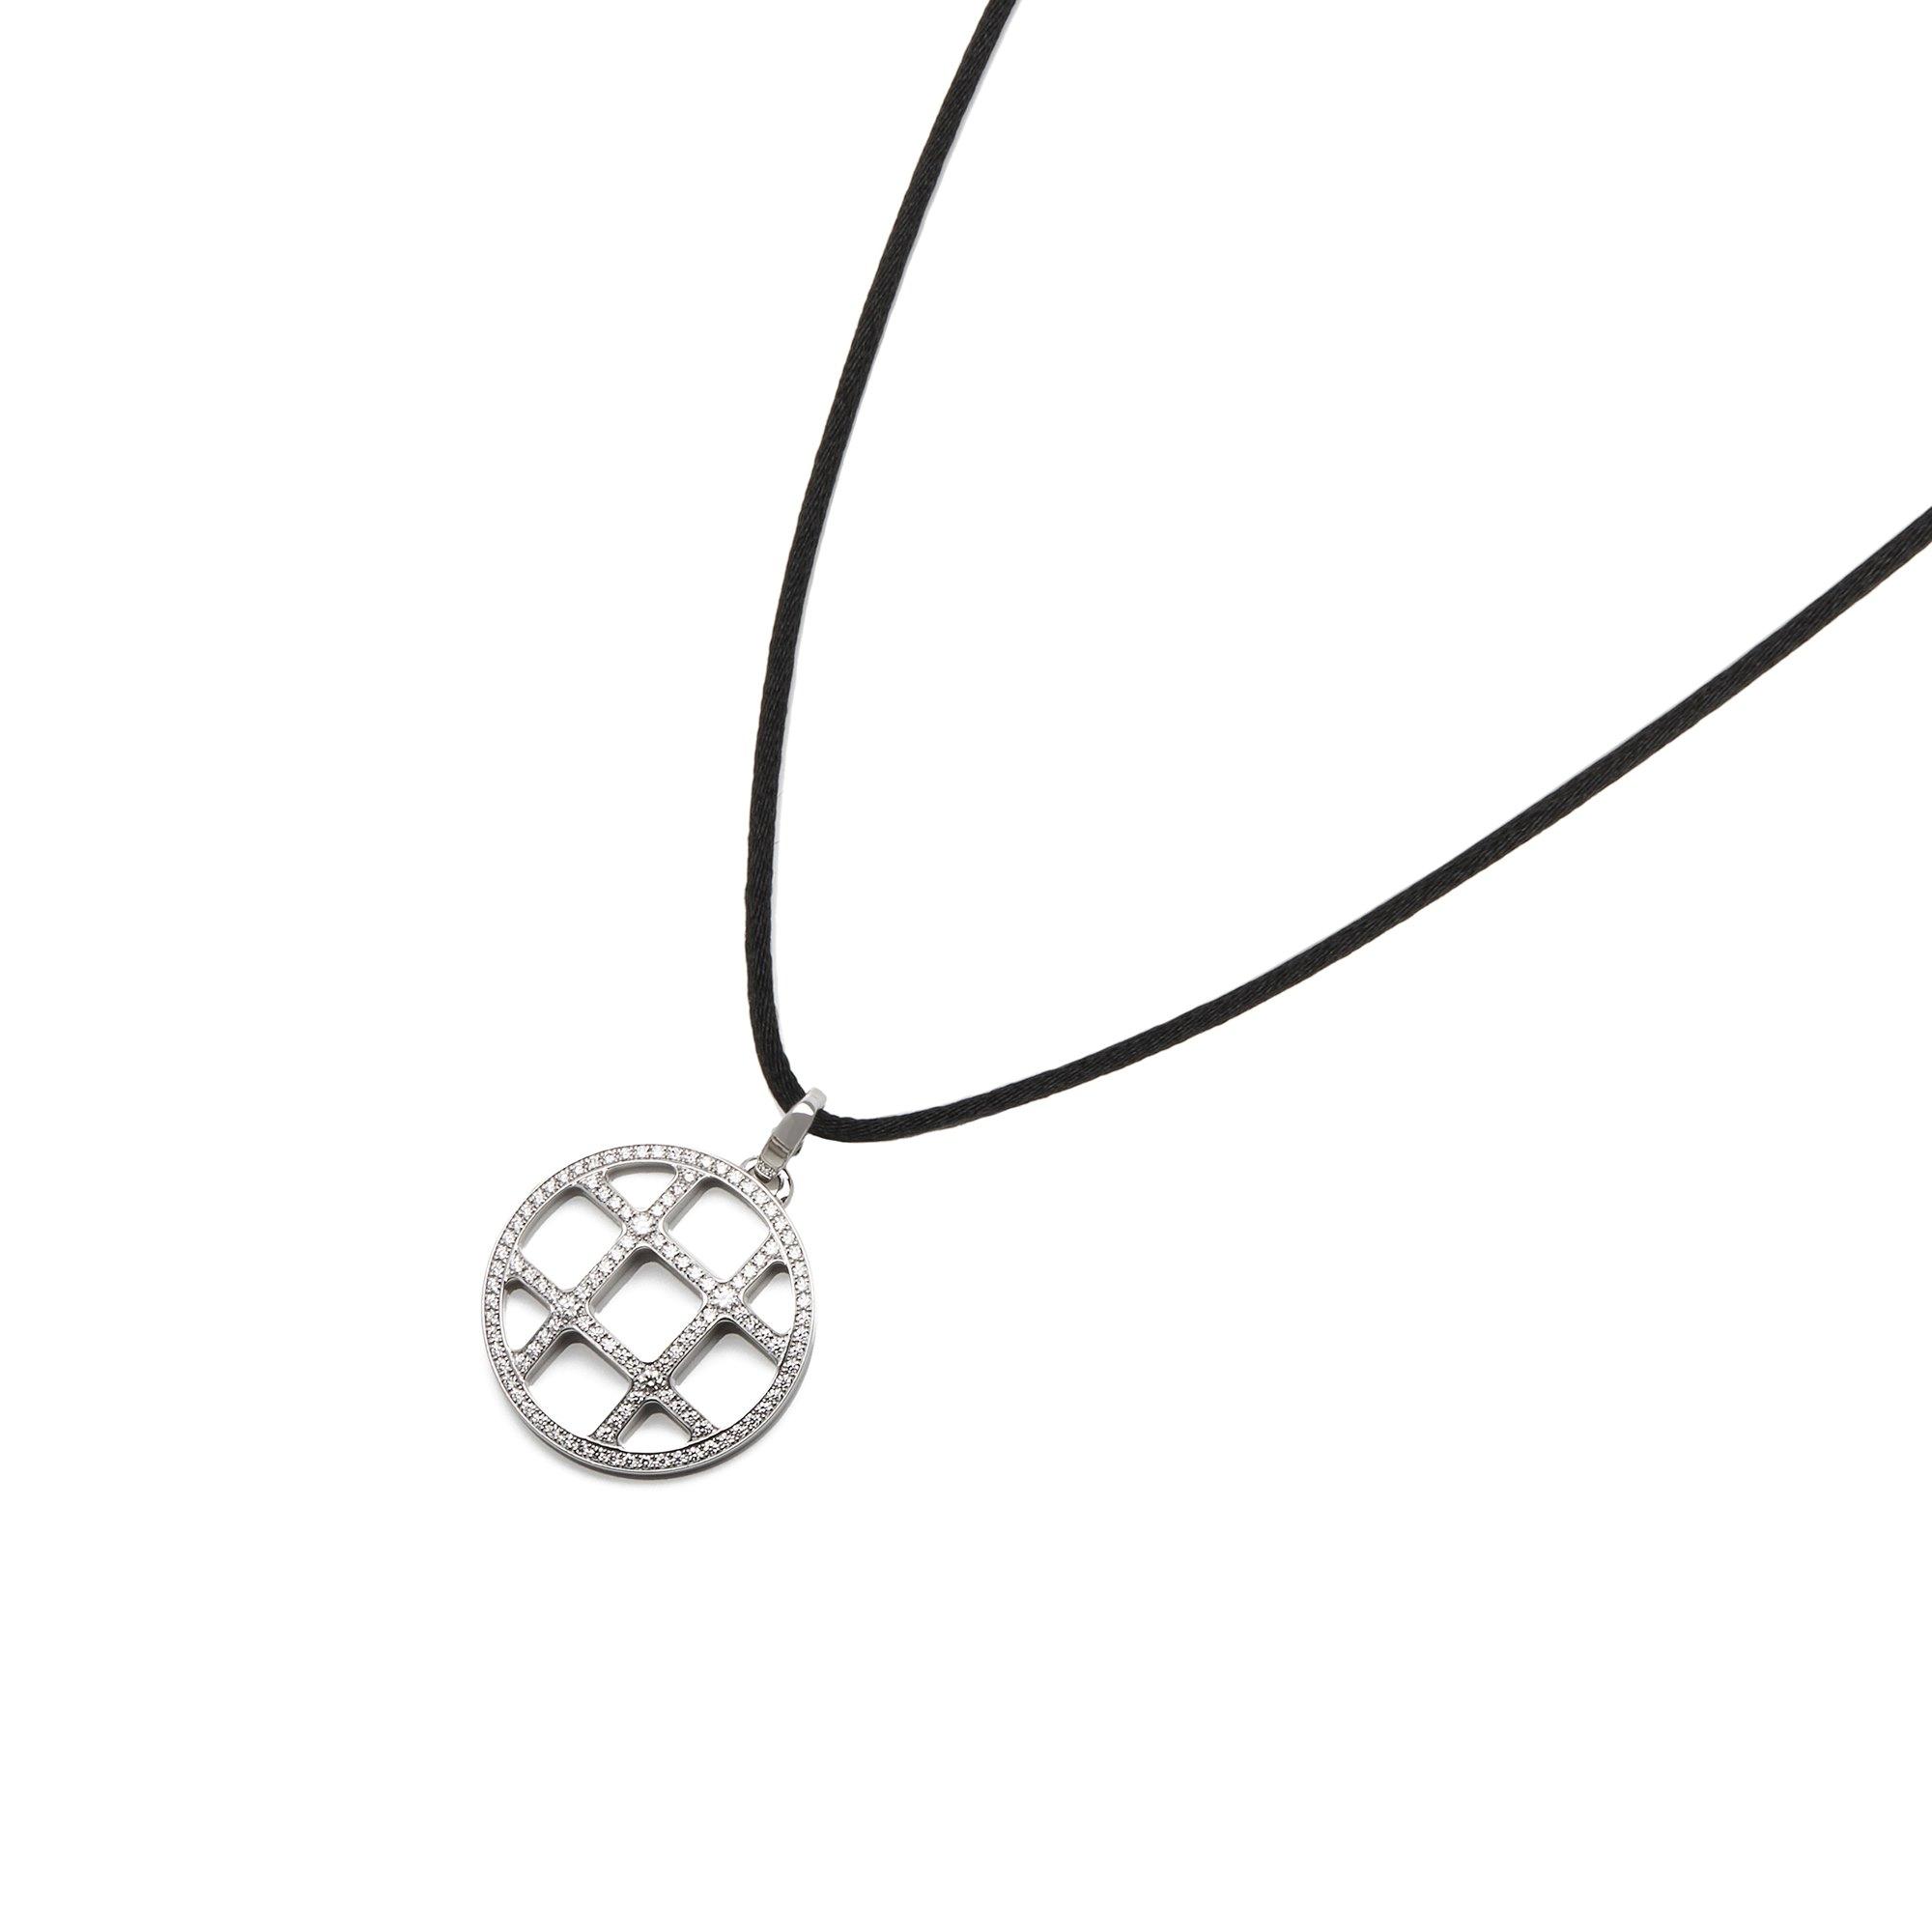 Cartier 18k White Gold Pasha Necklace